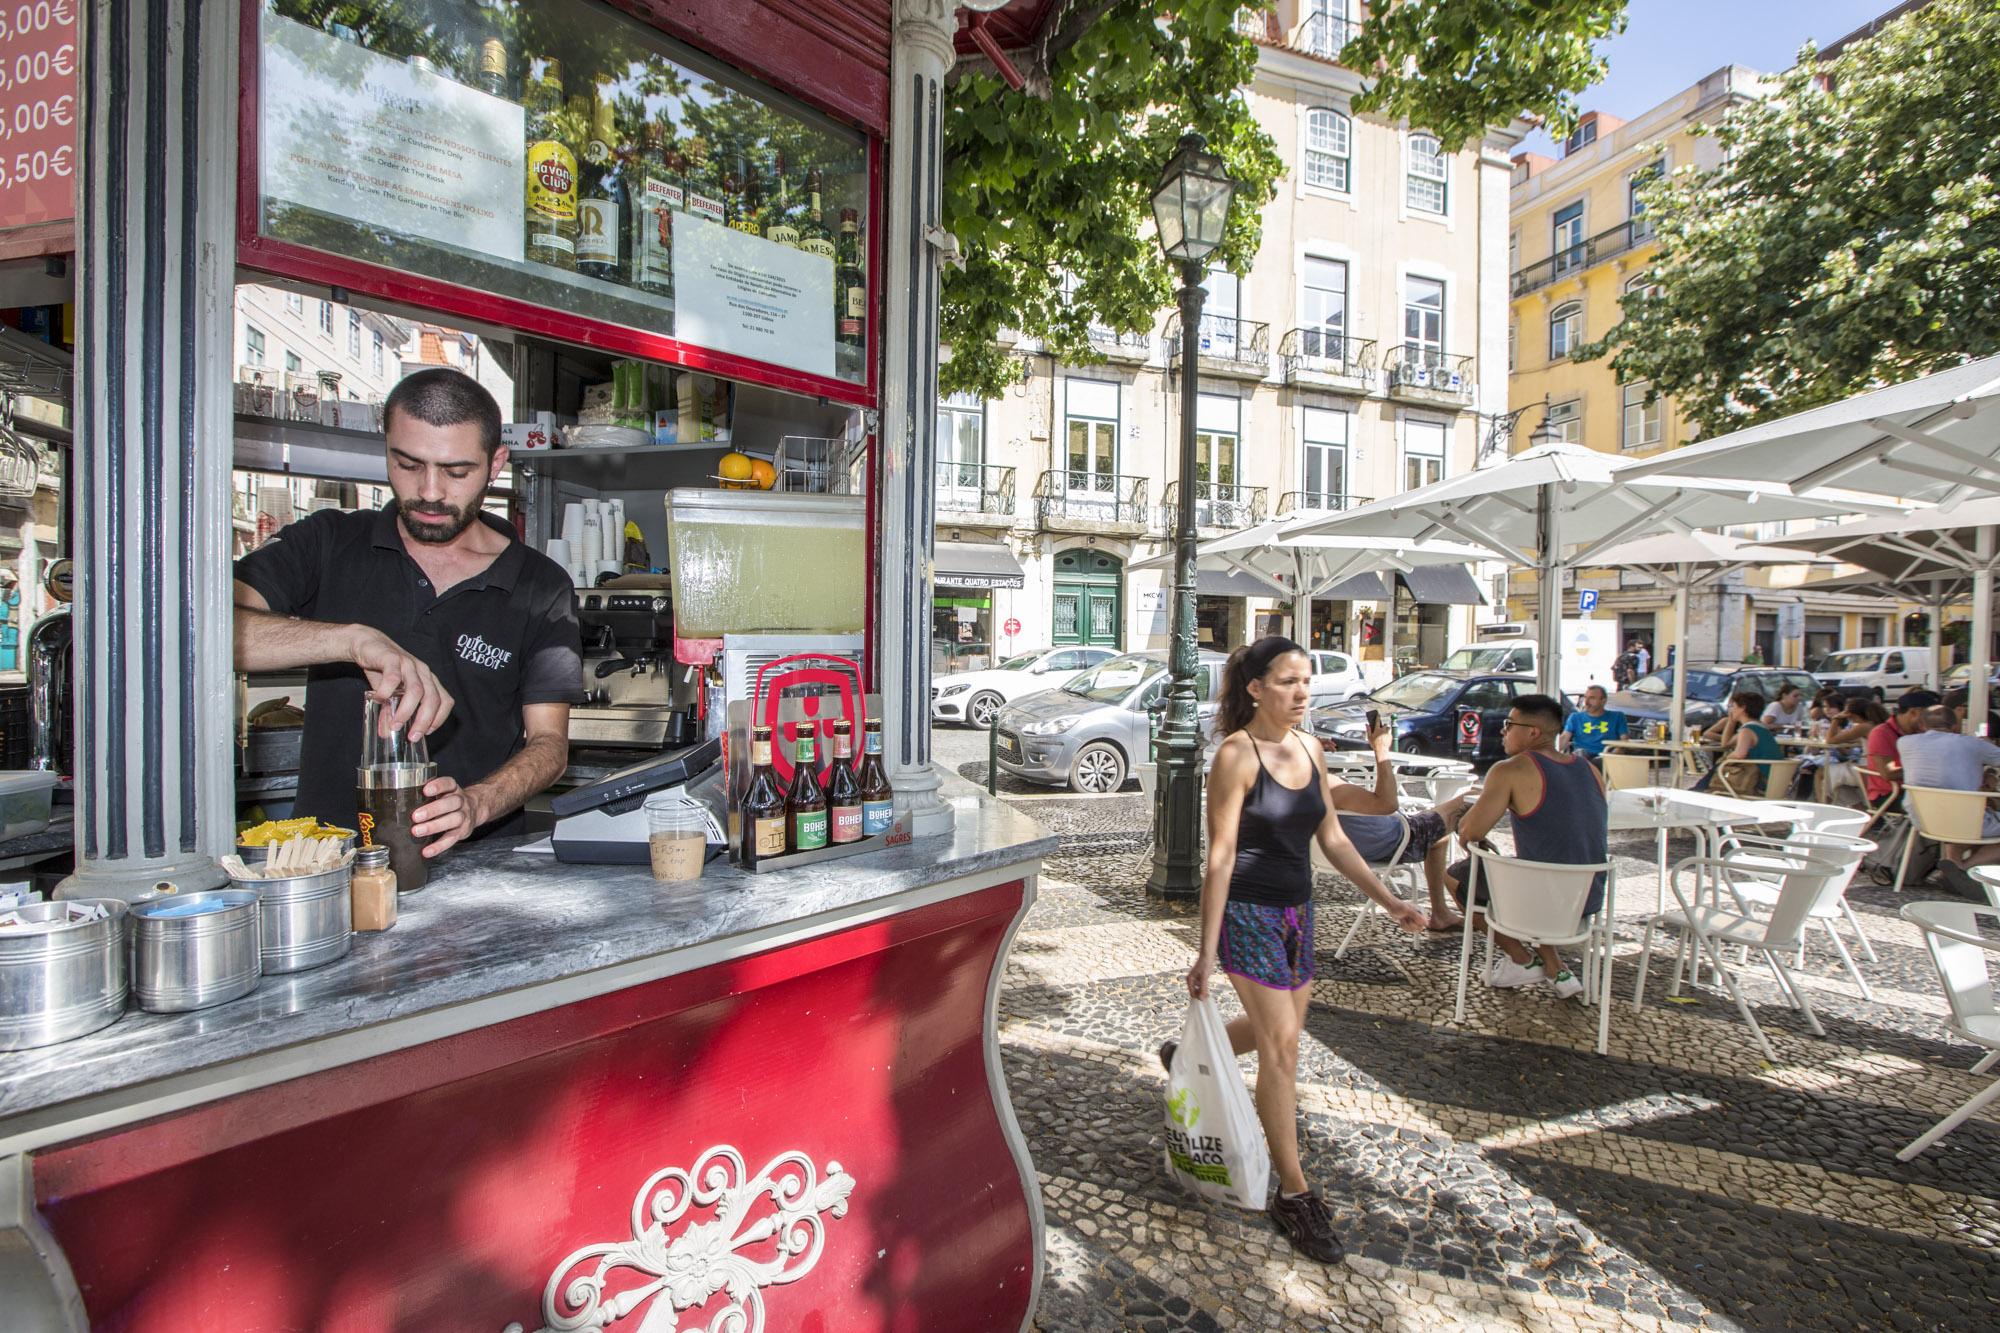 Portugal, Lissabon, Praca Sao Paulo, Ältester Kiosk in Lissabon, Kellner João Fortuna